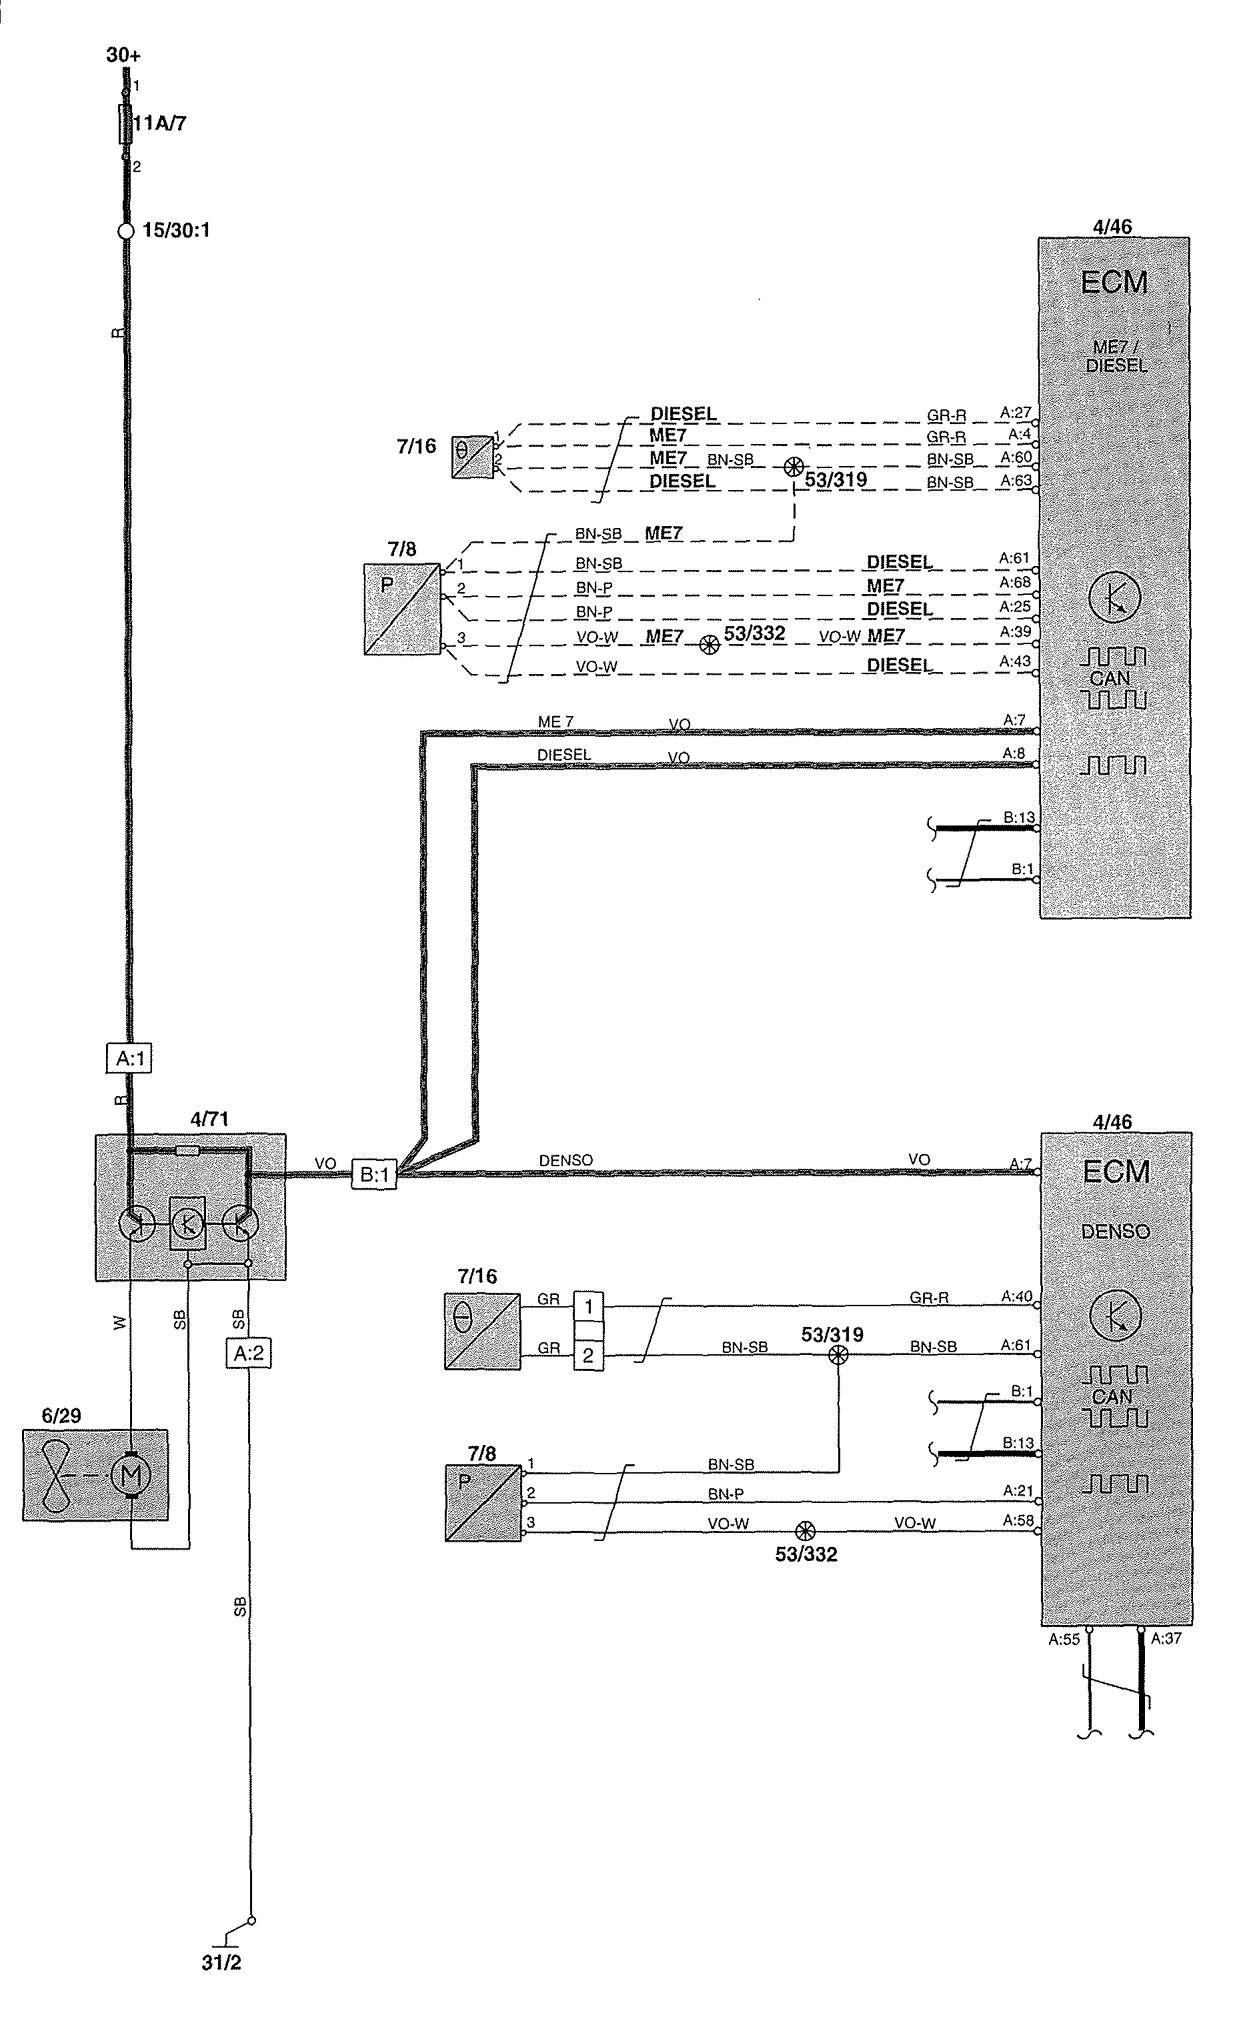 volvo xc90 alternator wiring diagram volvo d1 30 wiring diagram